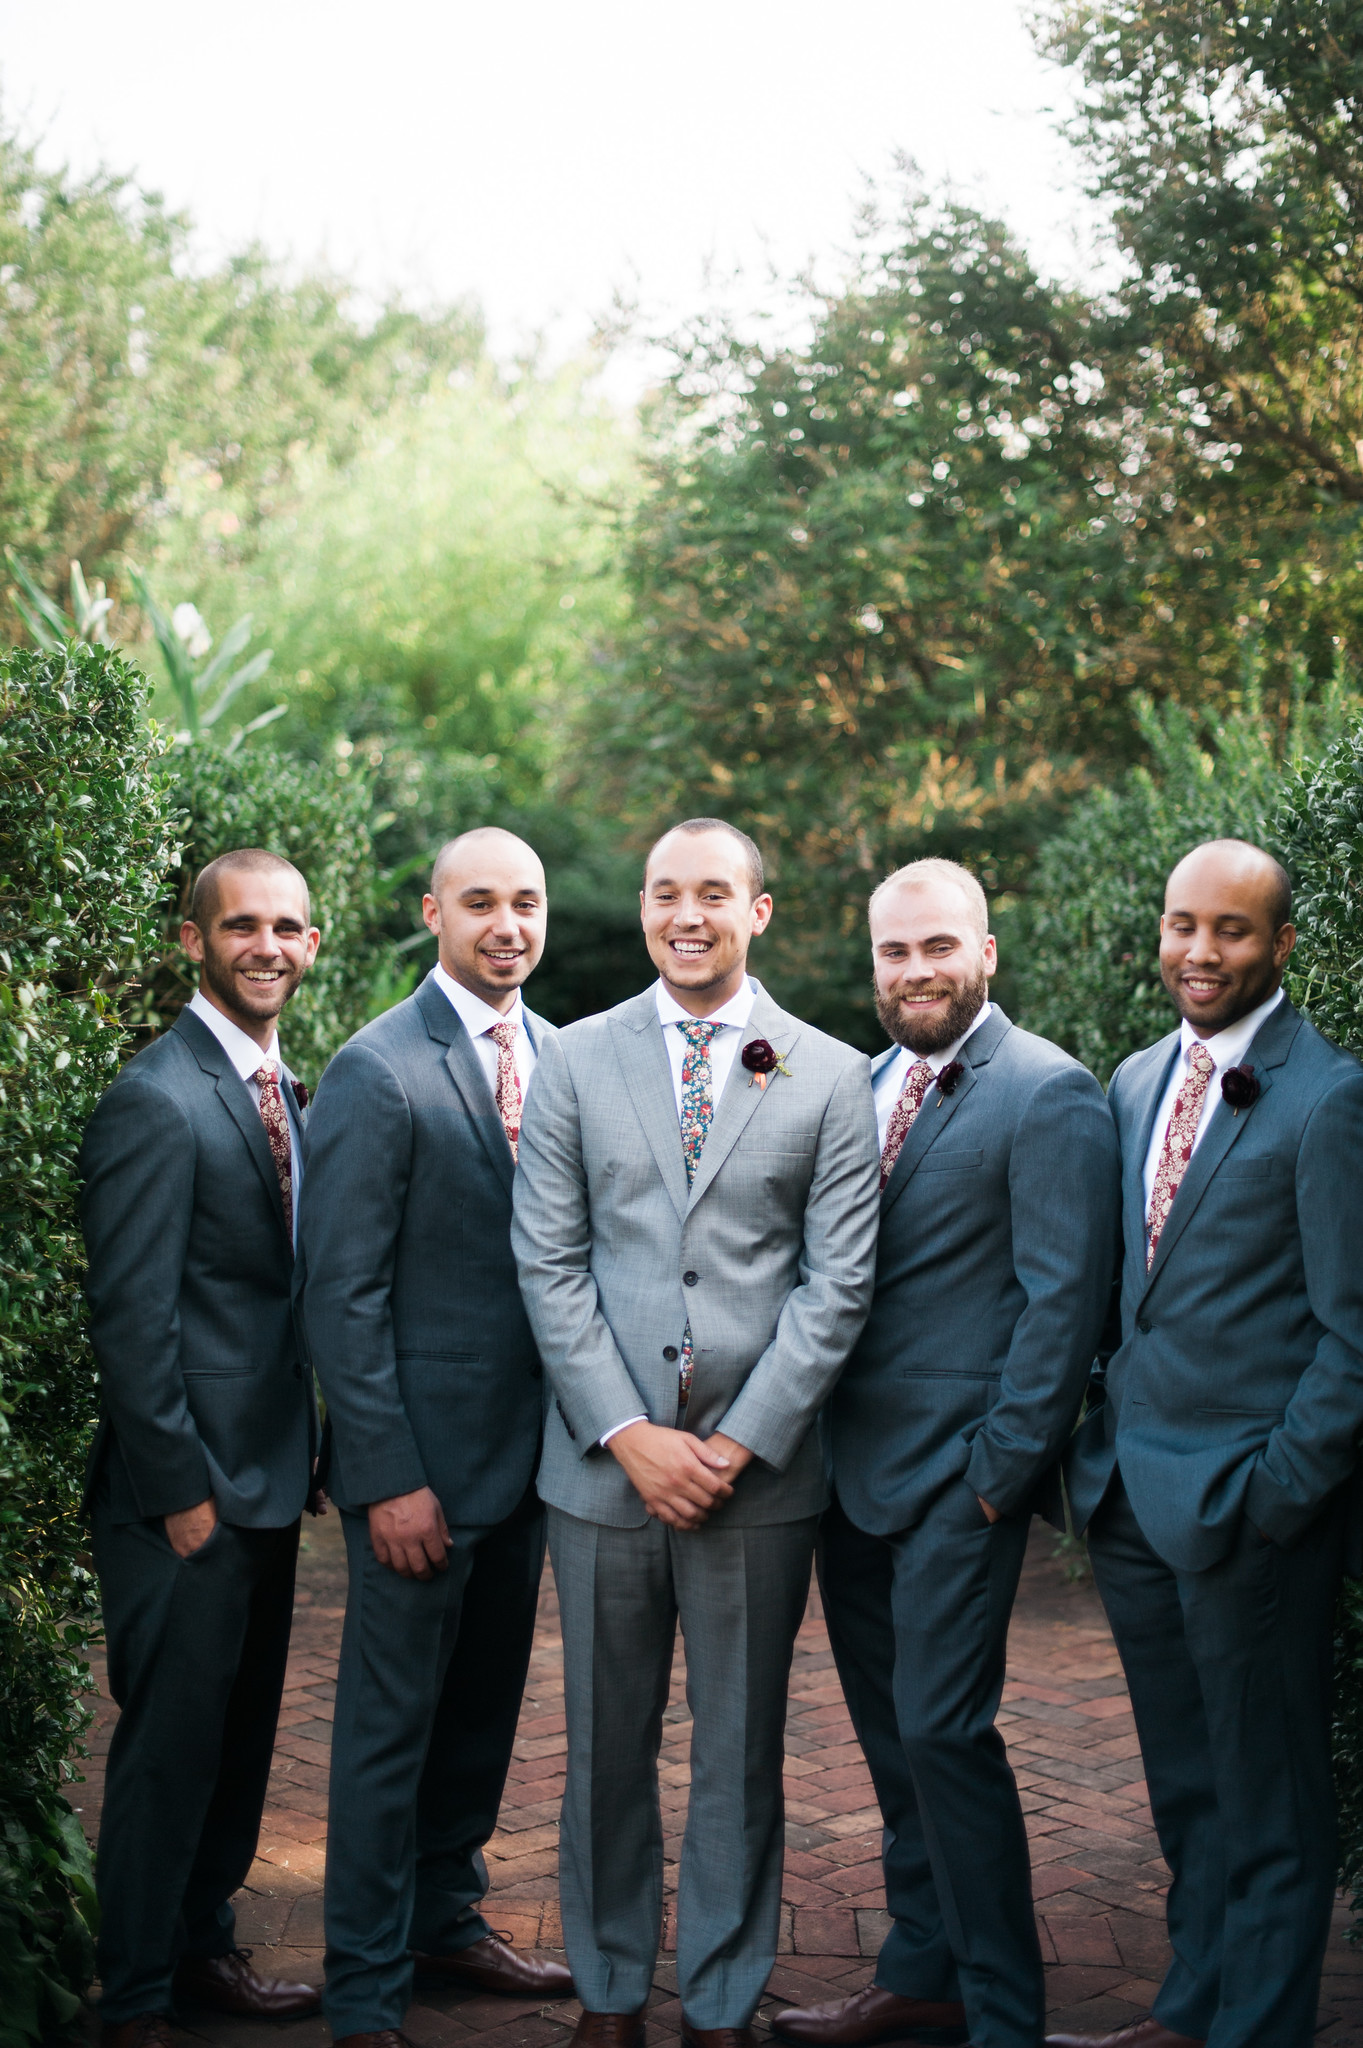 thomas-wedding-030-X4.jpg